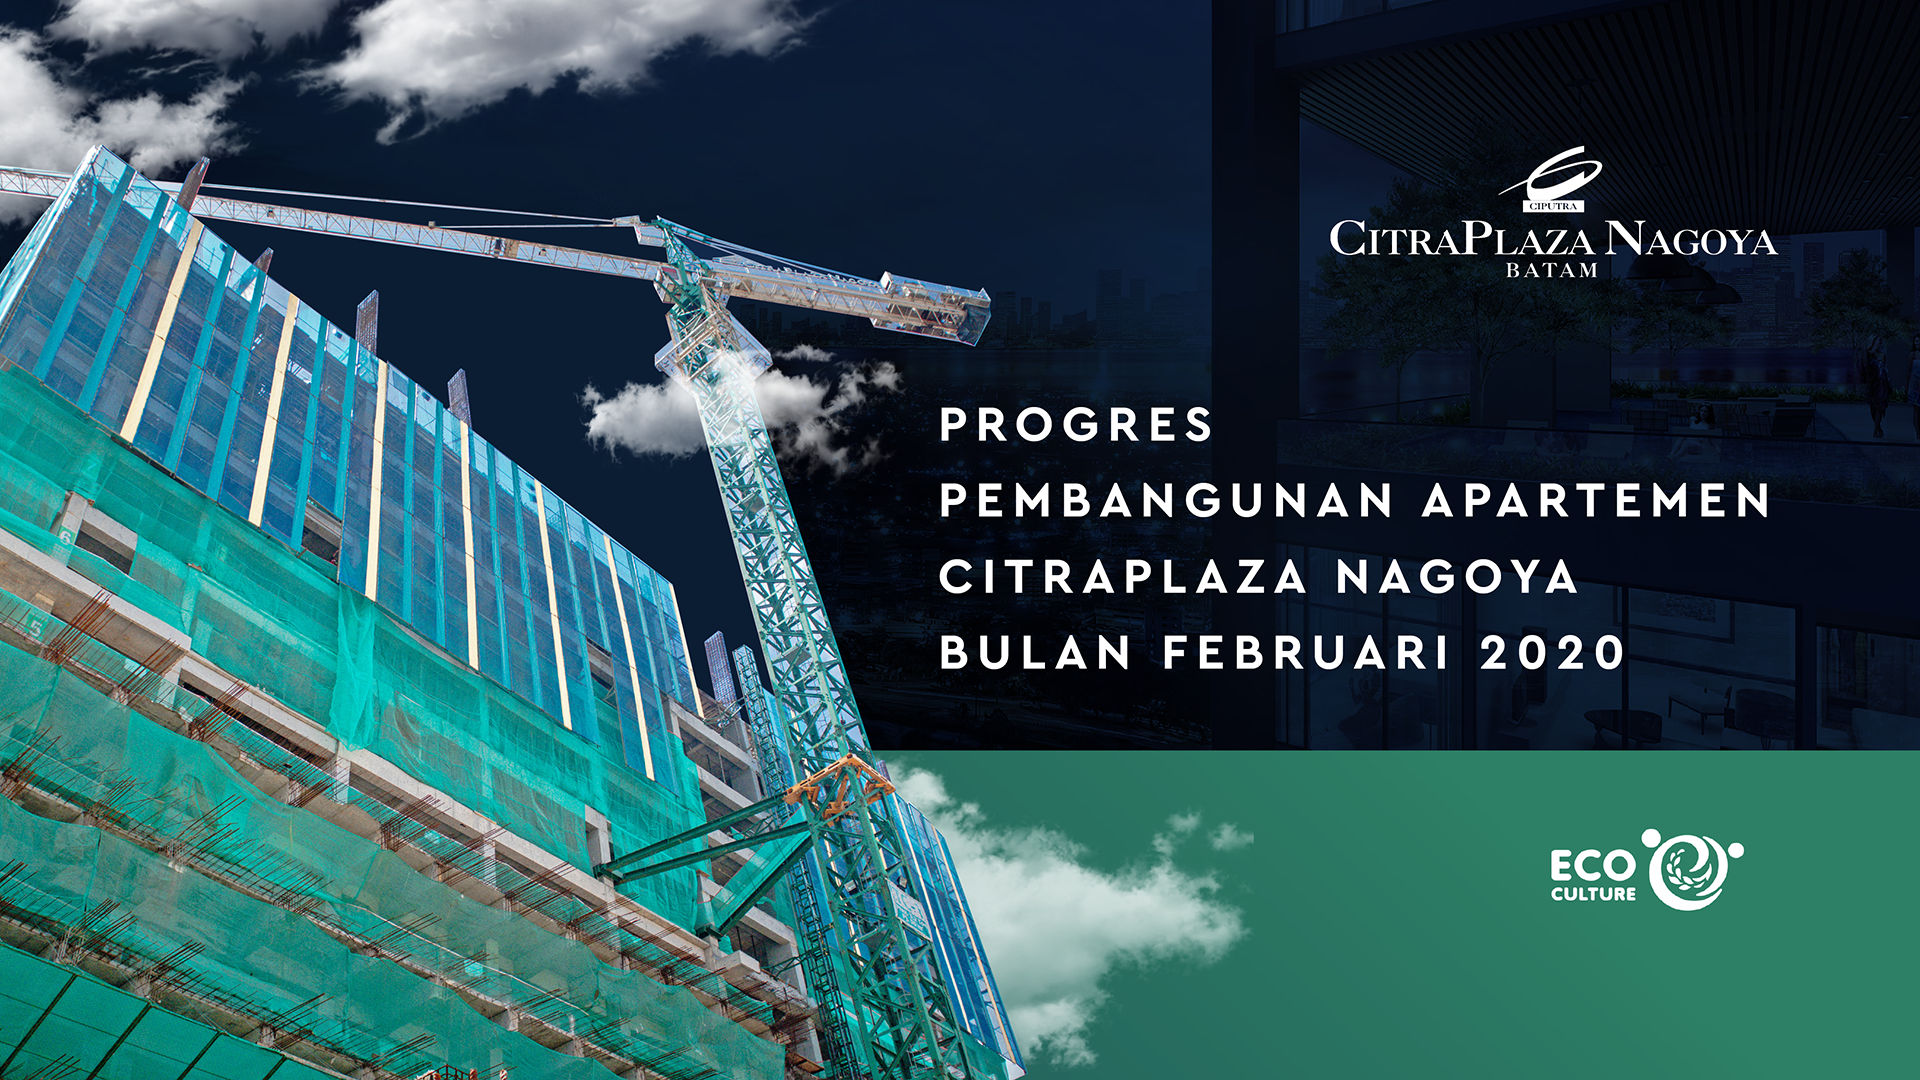 Progres Pembangunan Apartemen CitraPlaza Nagoya Bulan Februari 2020 - CitraPlaza Nagoya